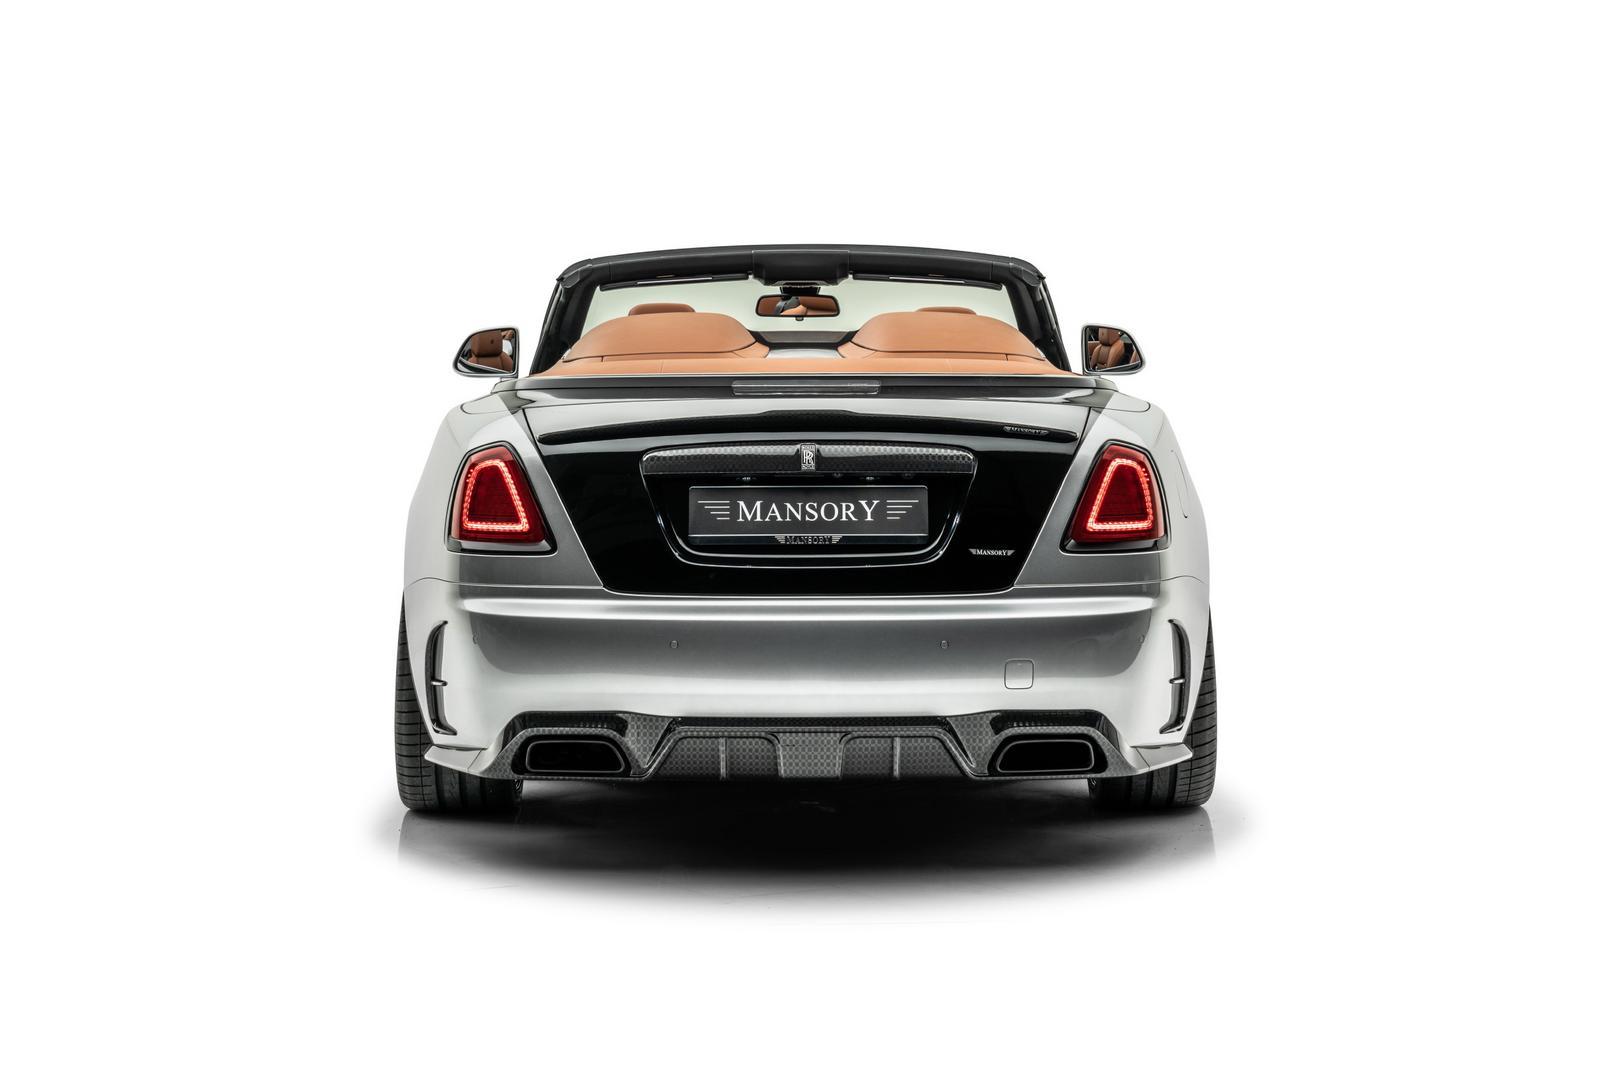 Mansory RR Dawn rear view